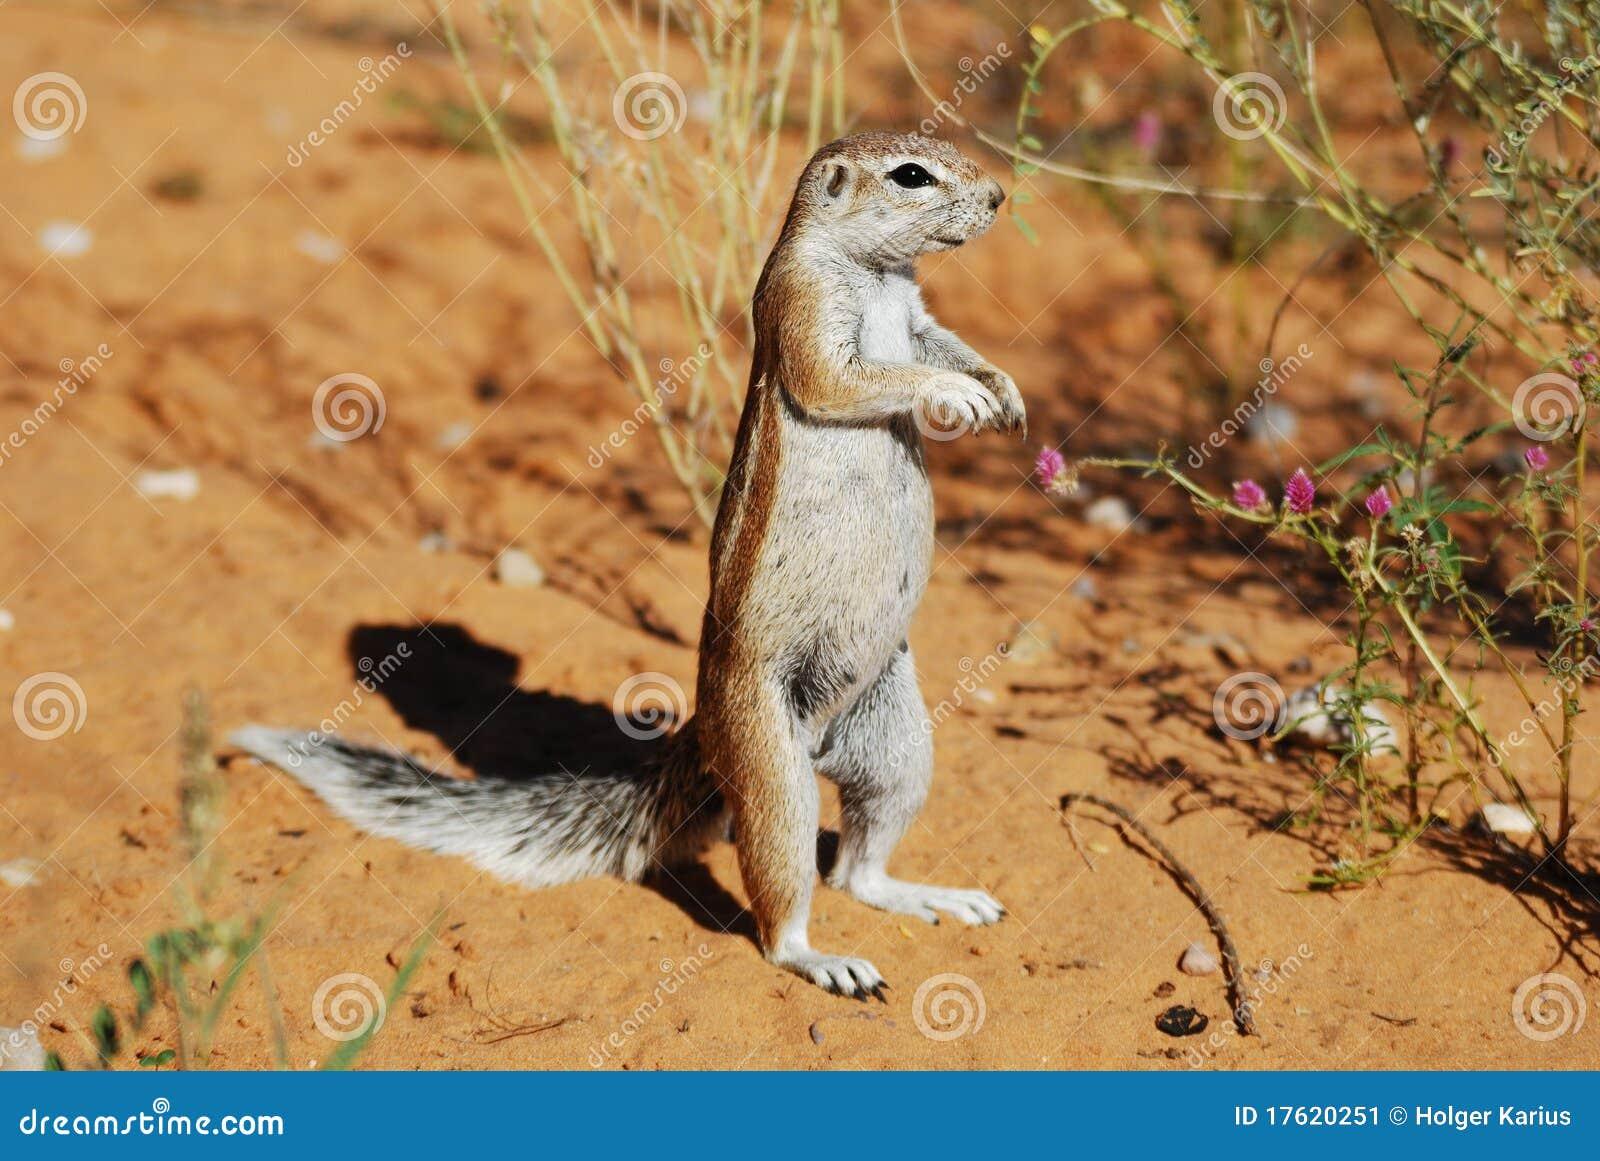 Ground Squirrel (Xerus Inauris) Stock Image - Image: 17620251